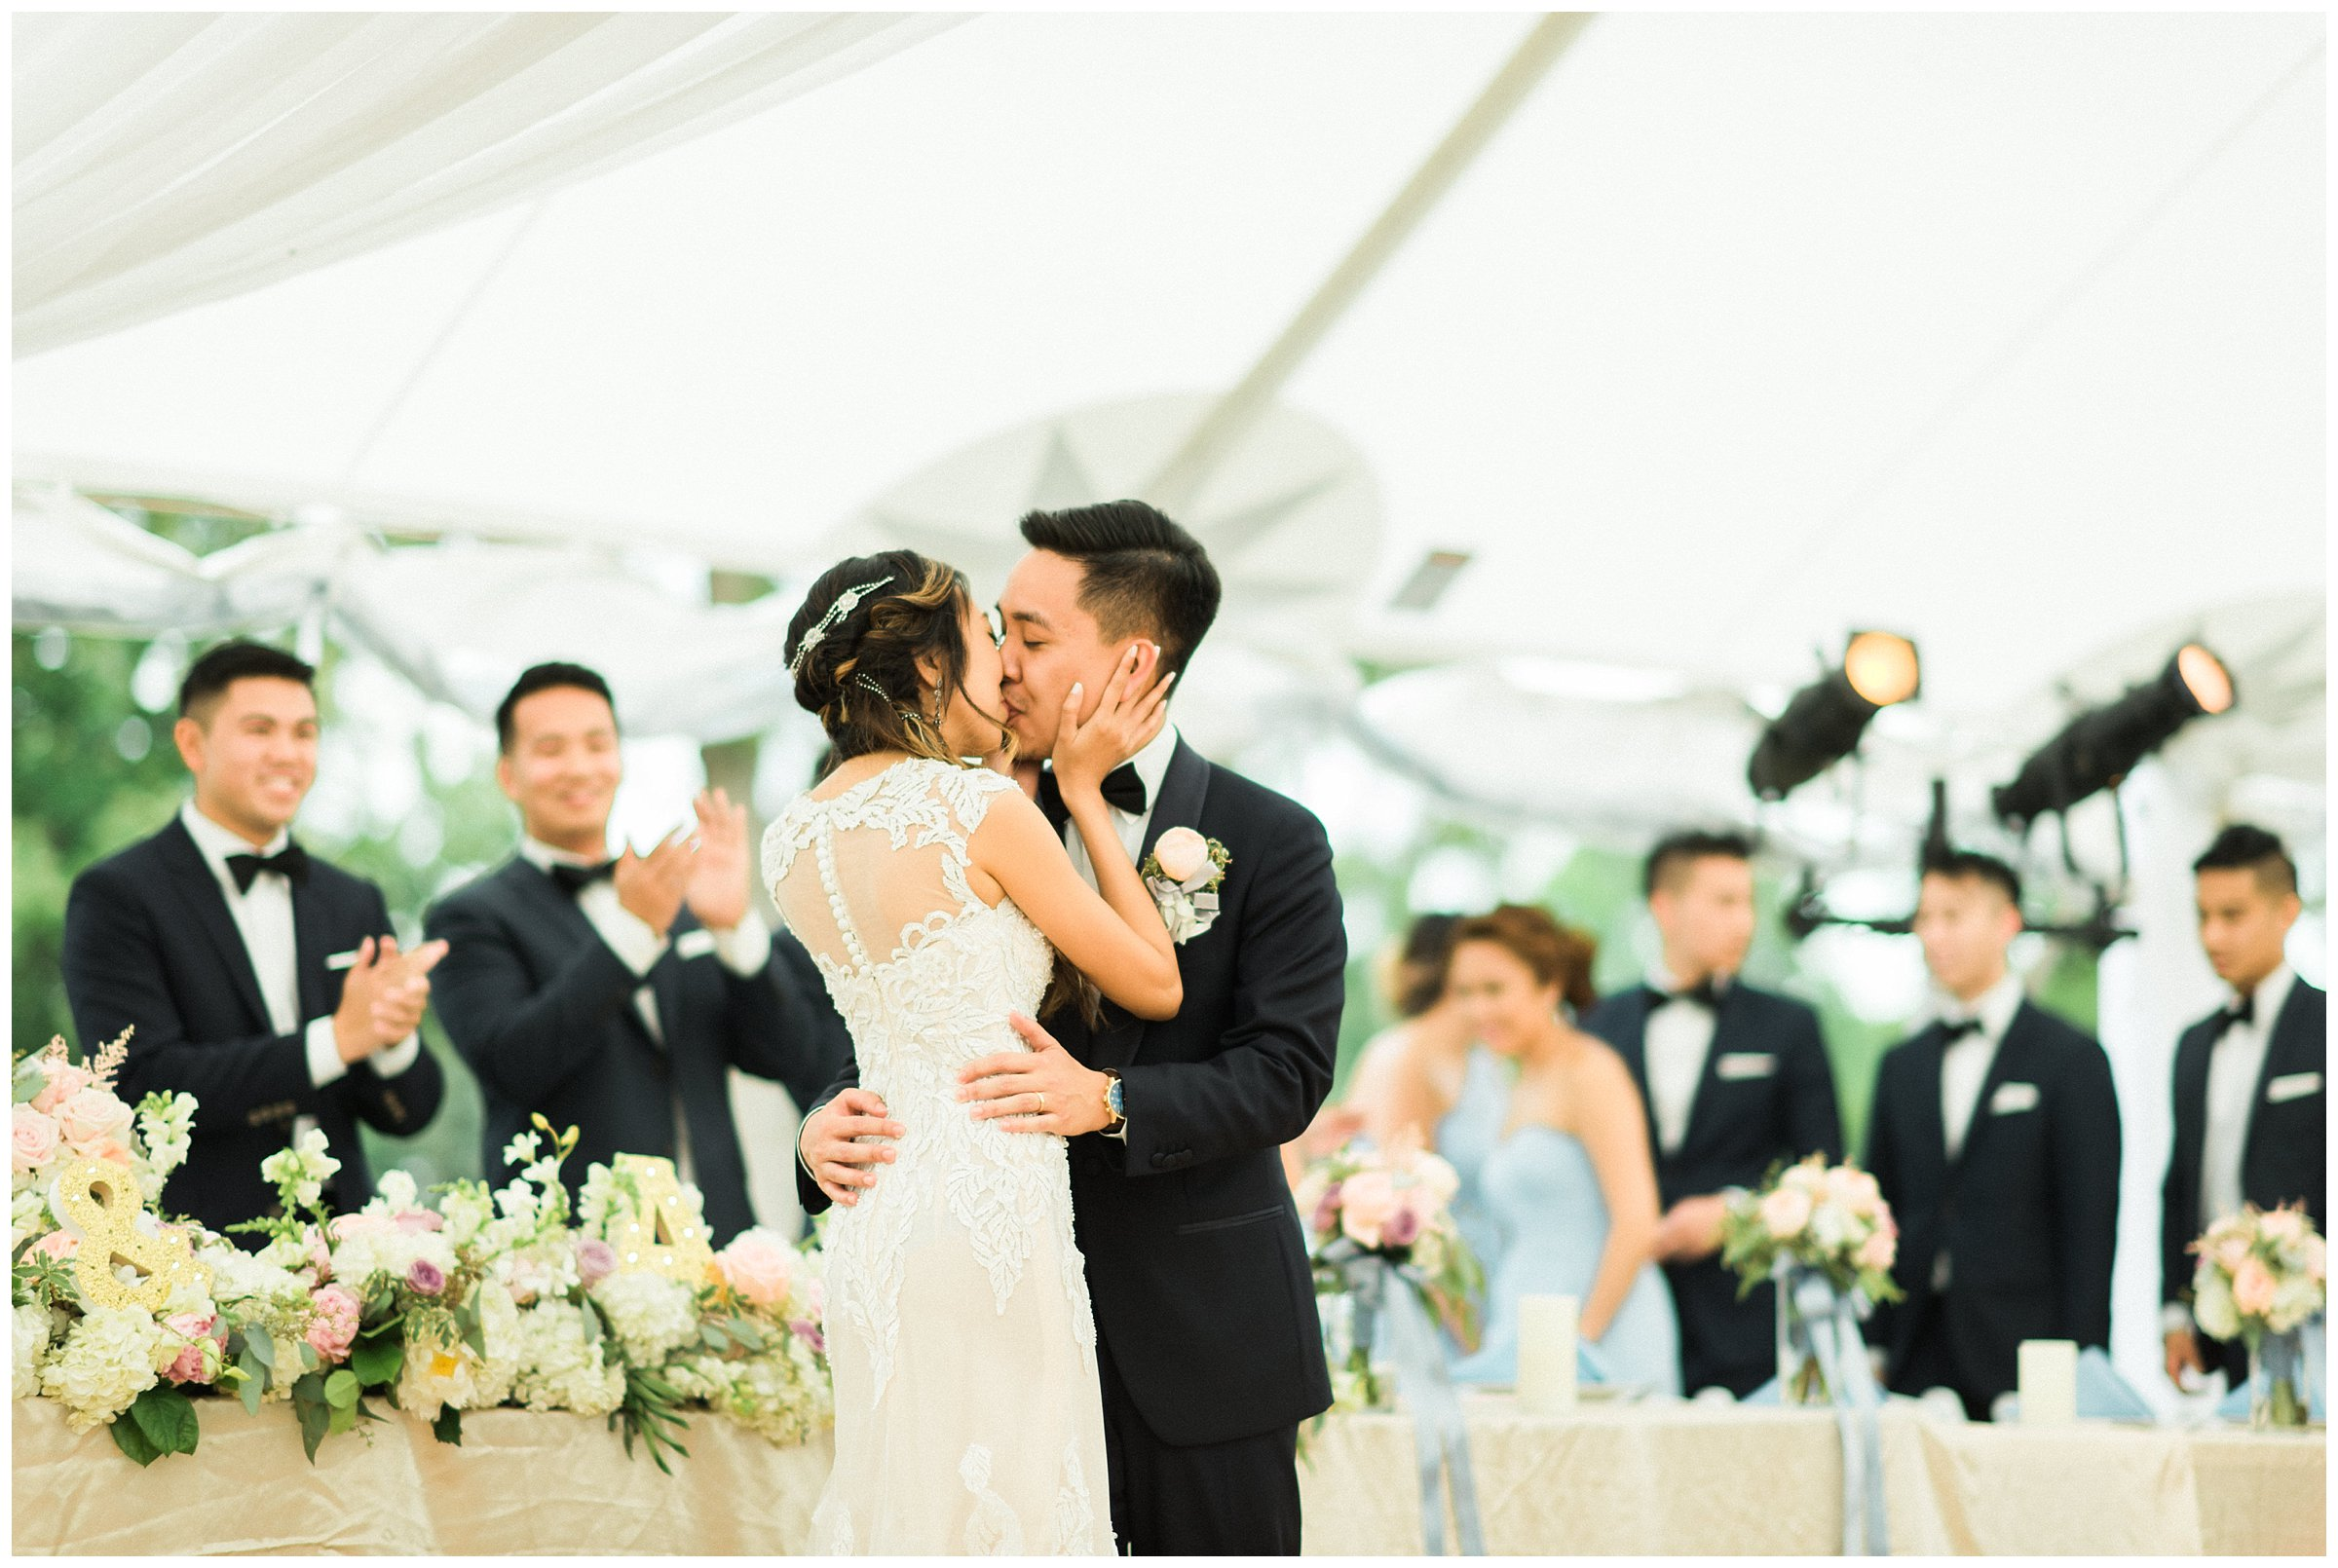 endicott-estate-wedding-photography1173.JPG